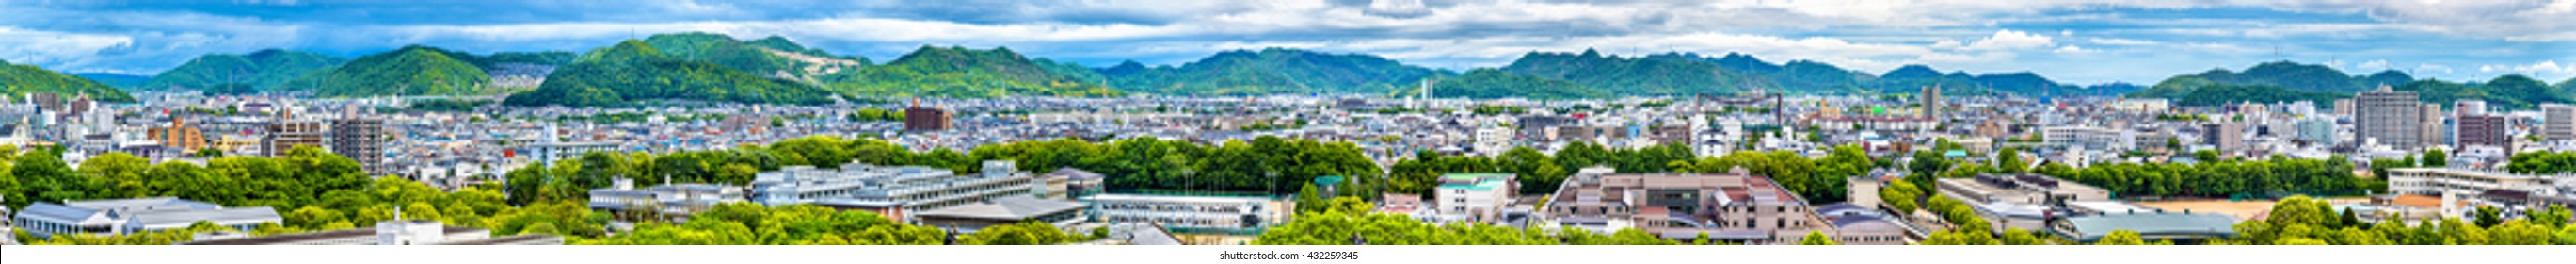 View of Himeji city from Himeji castle - Kansai, Japan